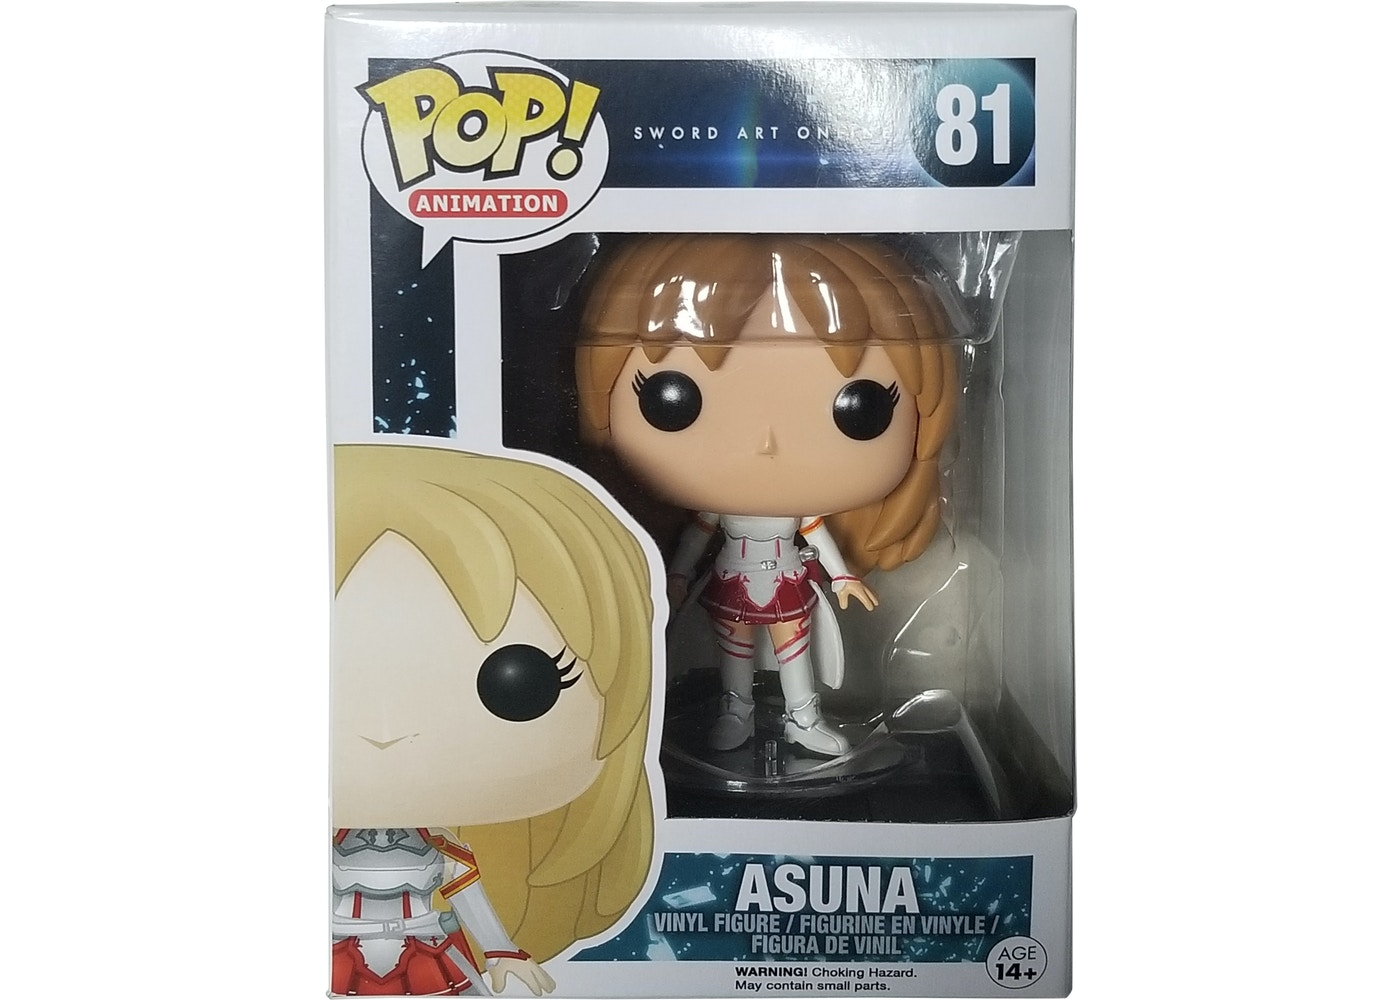 Funko Pop Animation Sword Art Online Asuna Figure 81